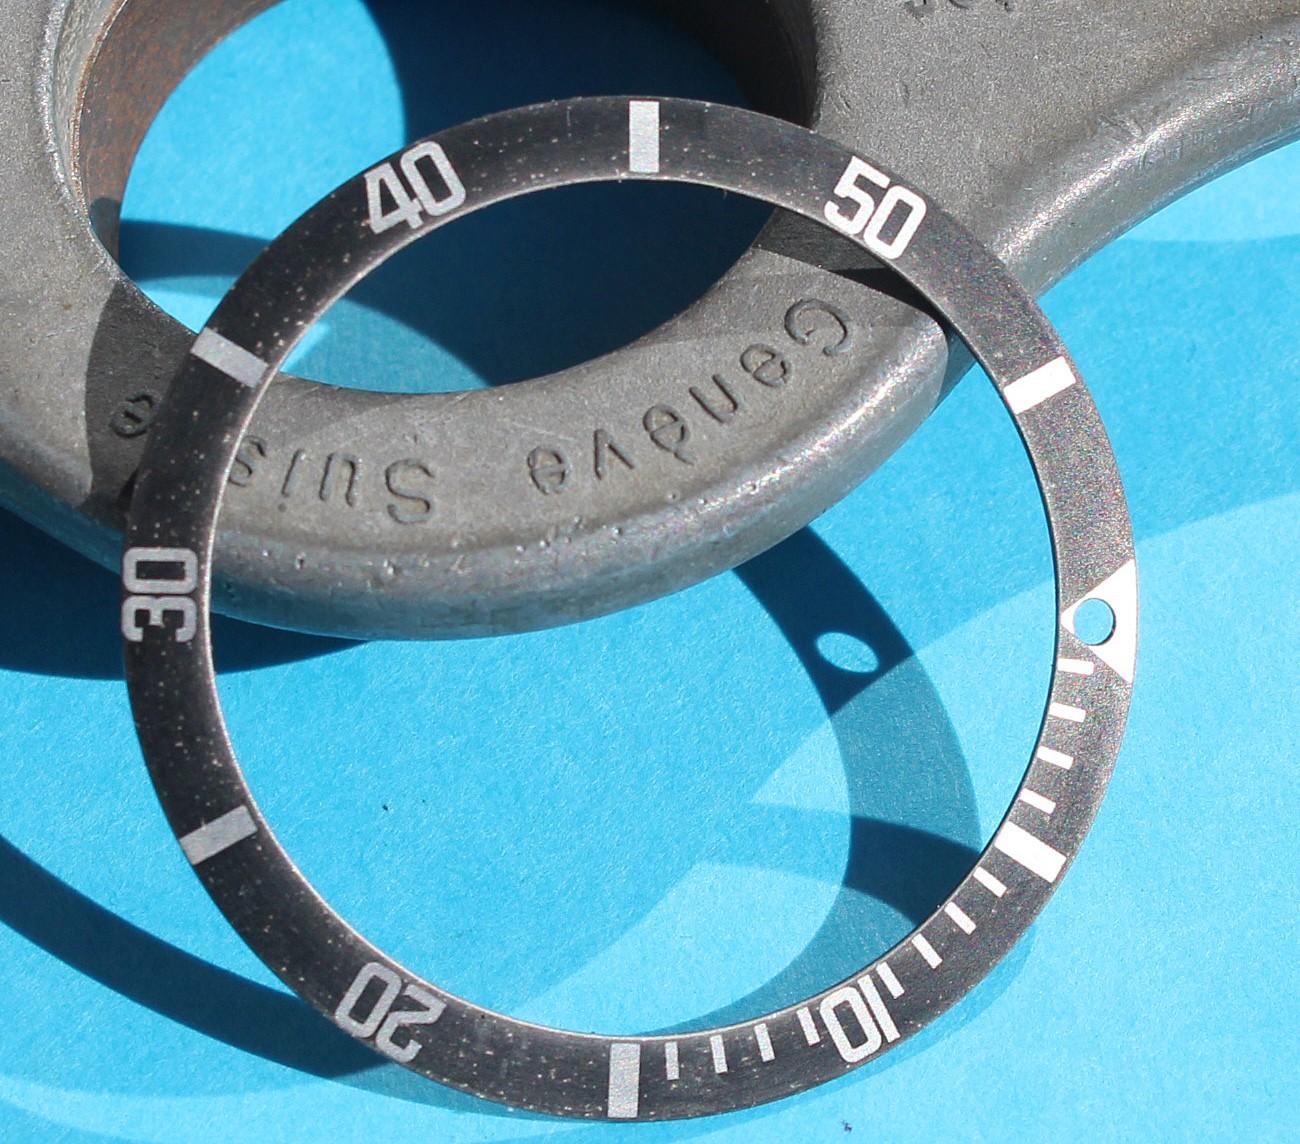 ORIGINAL VINTAGE FADED ROLEX BEZEL INSERT FAT FRONT MONTRES SUBMARINER 5513, 1680, 5512, 1665, 5508, 6538 Mk II